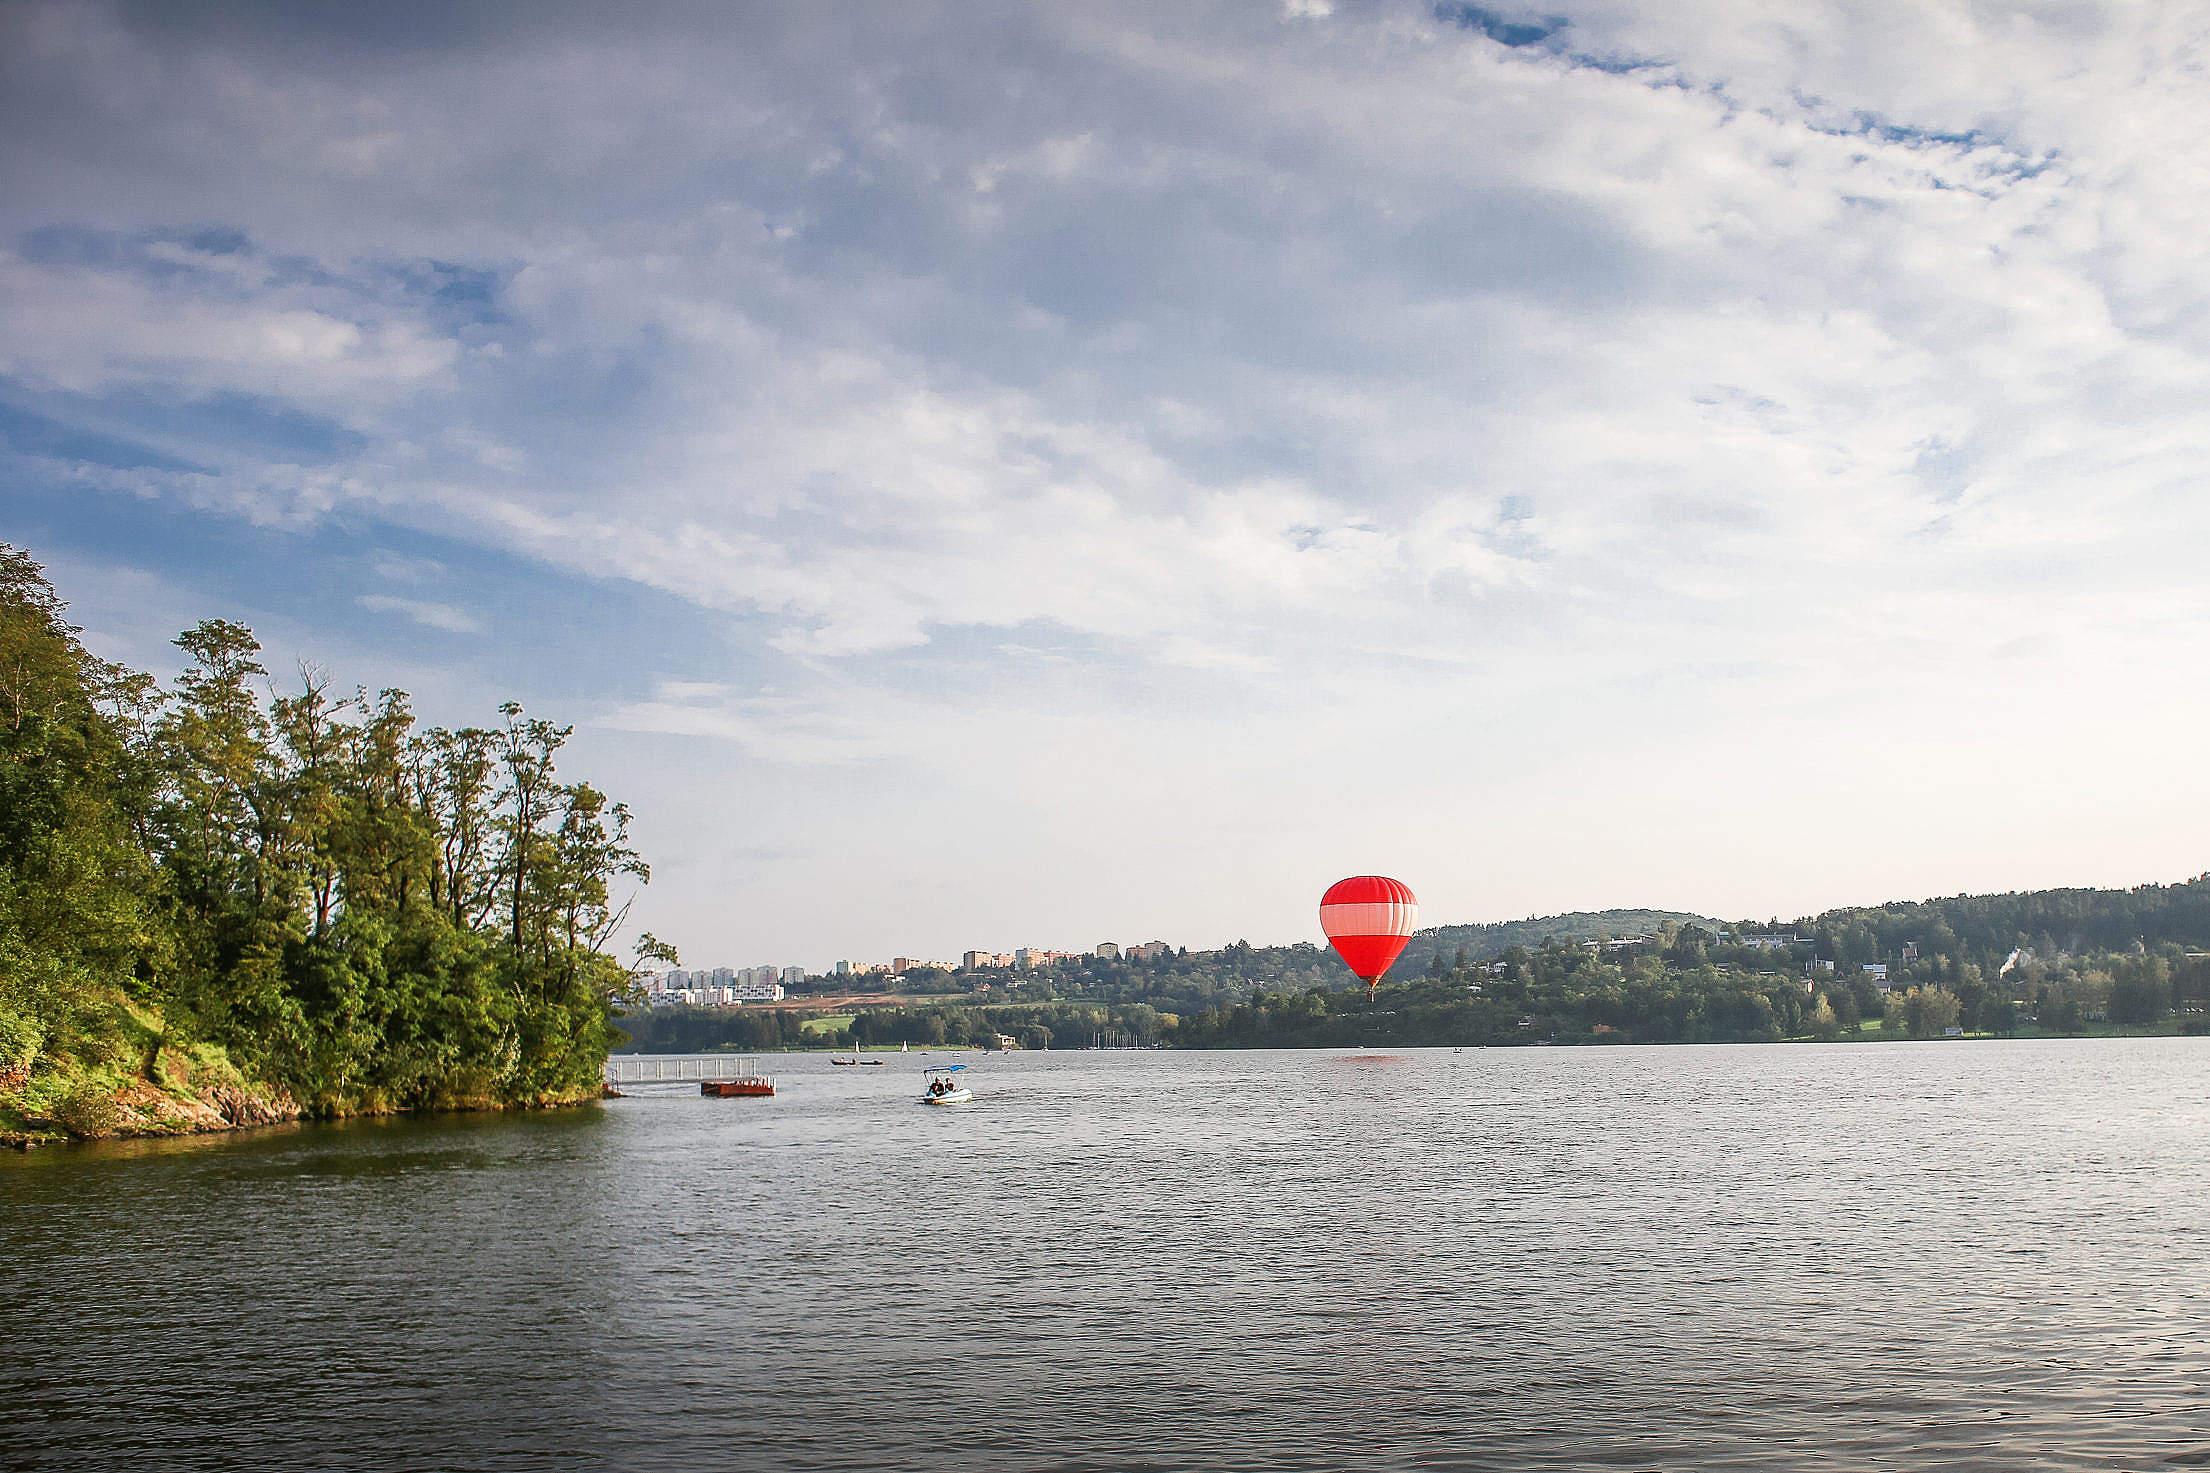 Hot Air Balloon over Lake Free Stock Photo